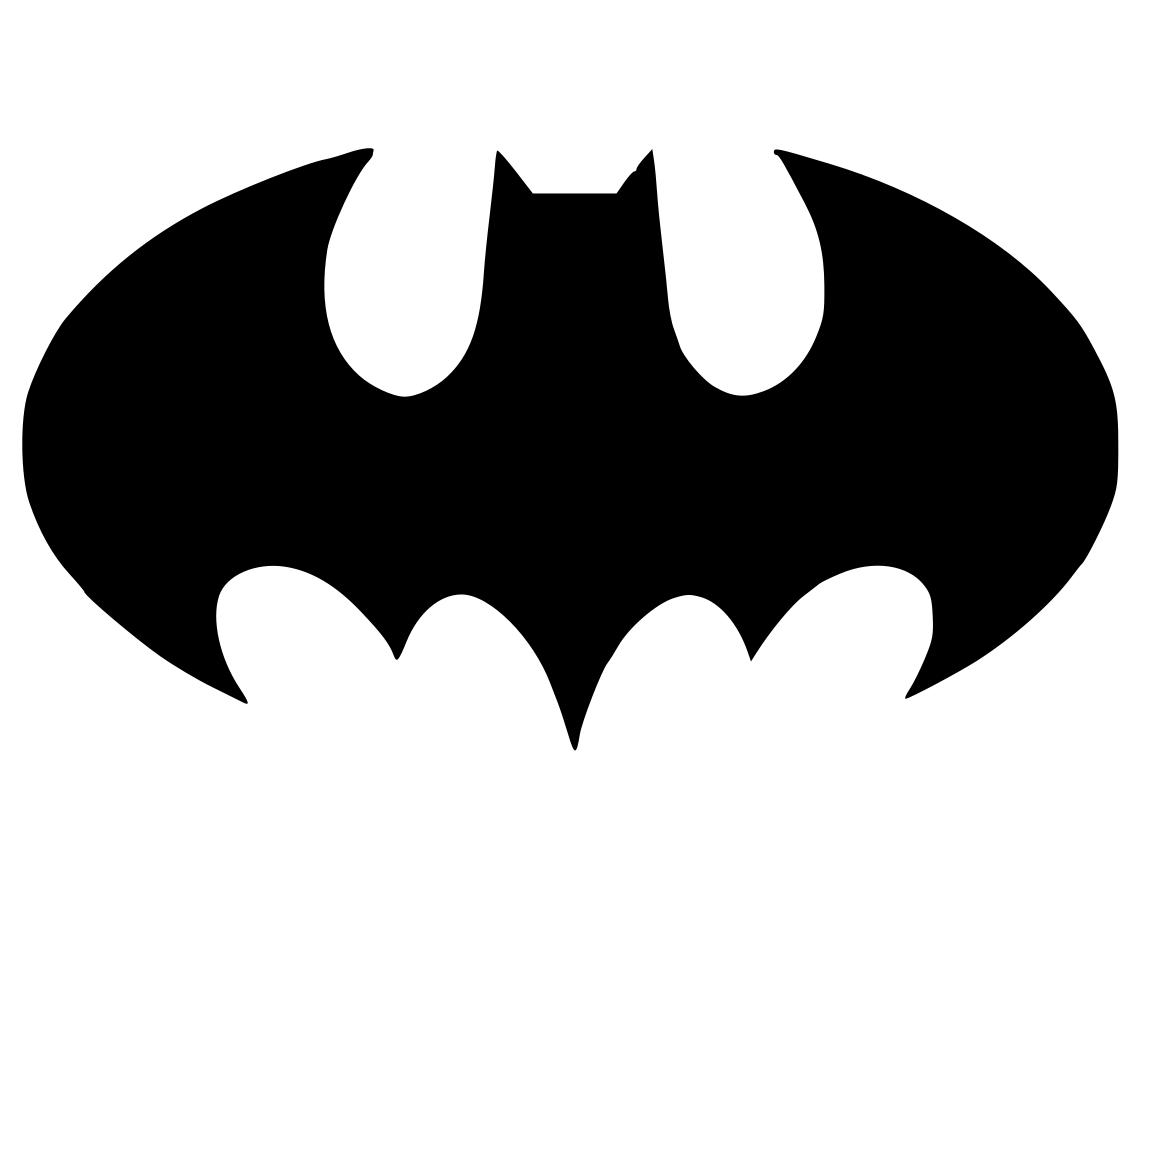 Cutting Files for You: Batman | Crafts | Pinterest ... Batman Silhouette